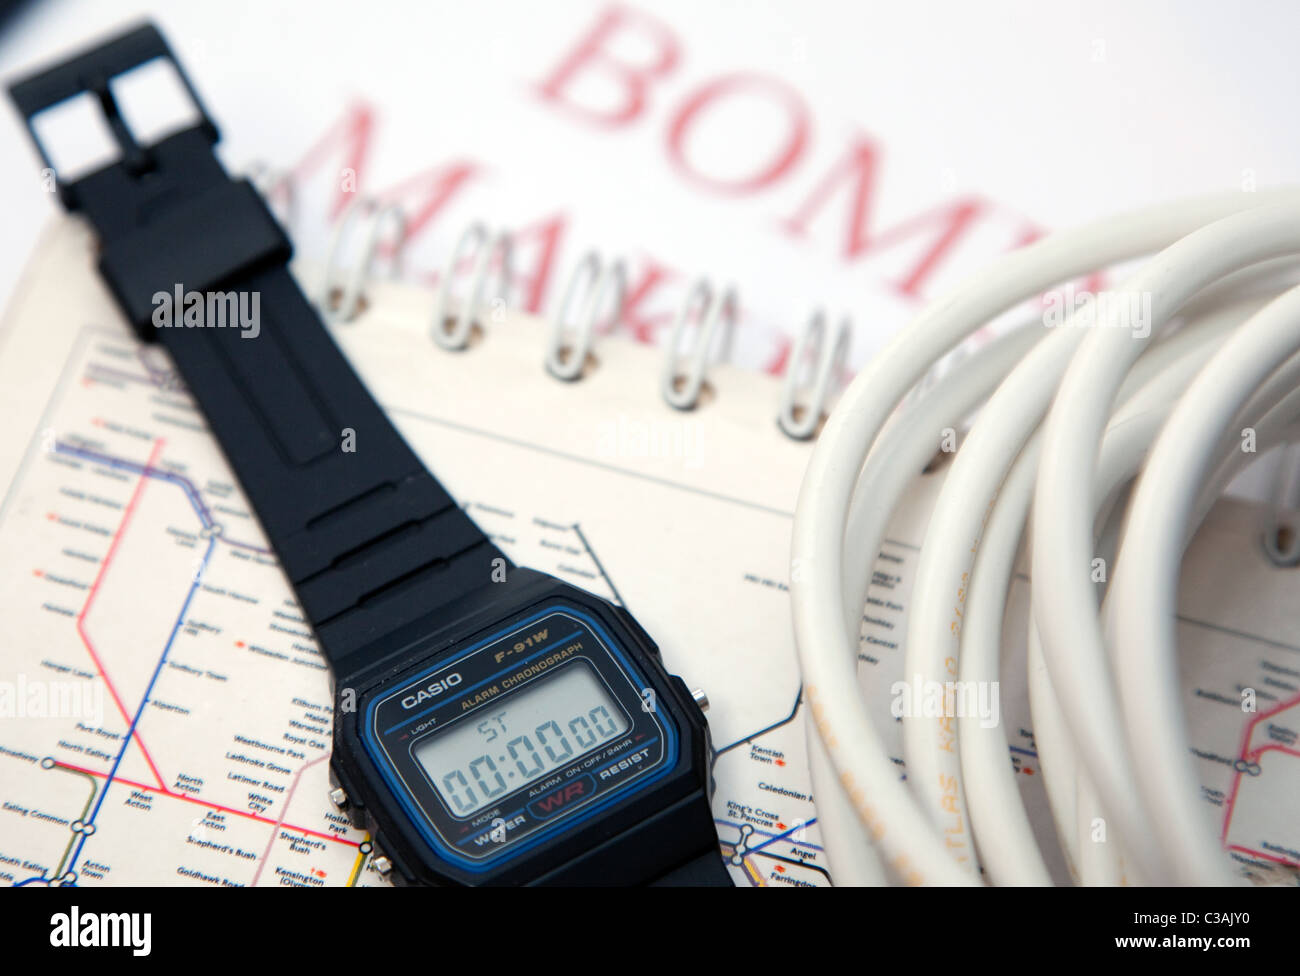 Casio F-91W reloj de pulsera Imagen De Stock